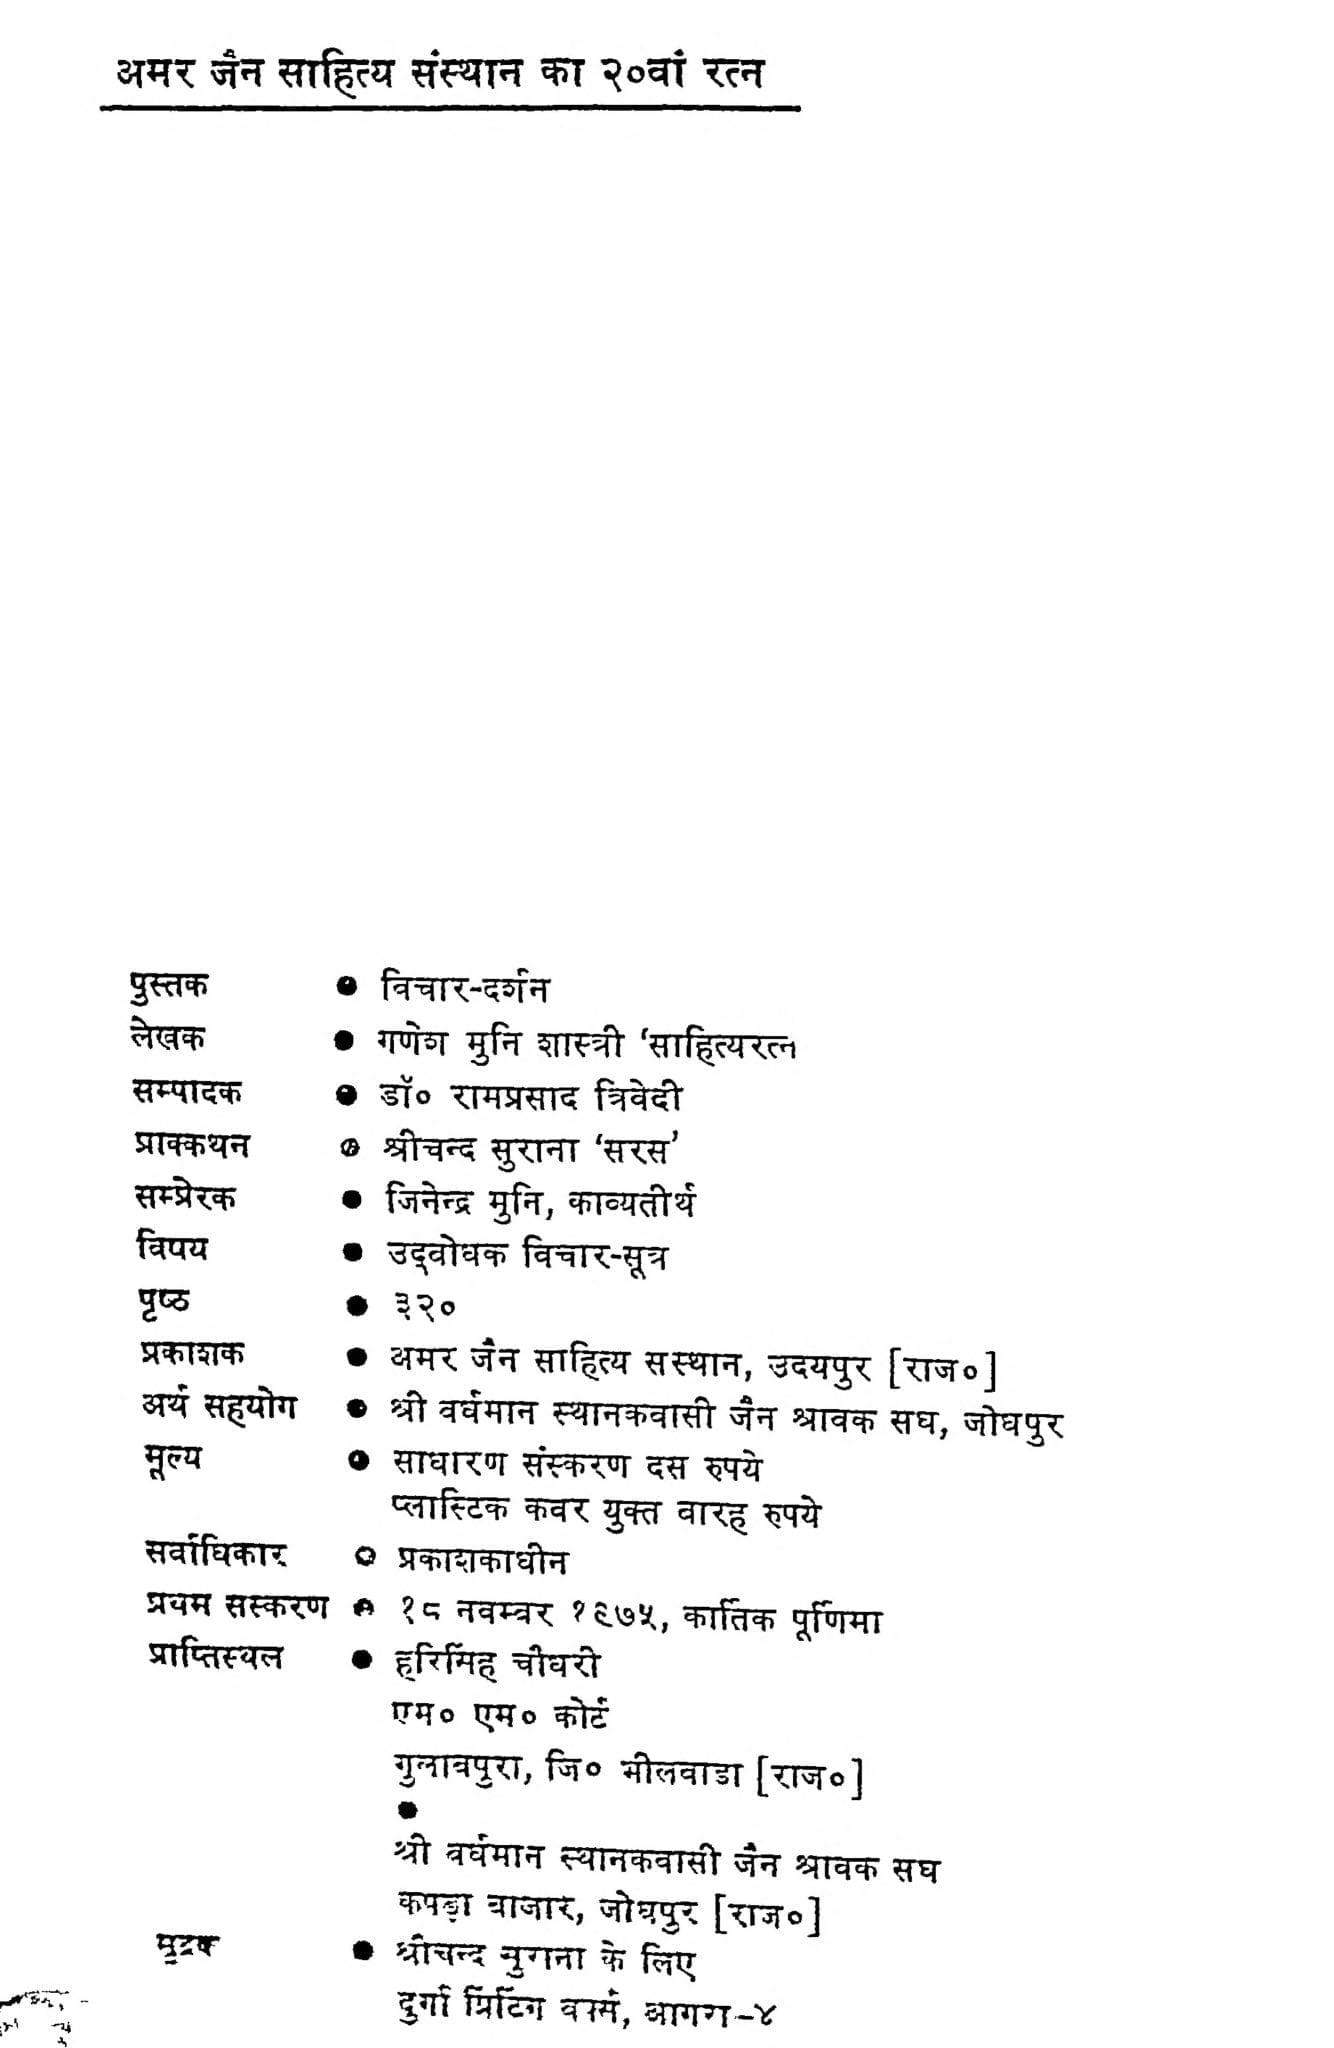 Book Image : विचार - दर्शन - Vichar Darshan